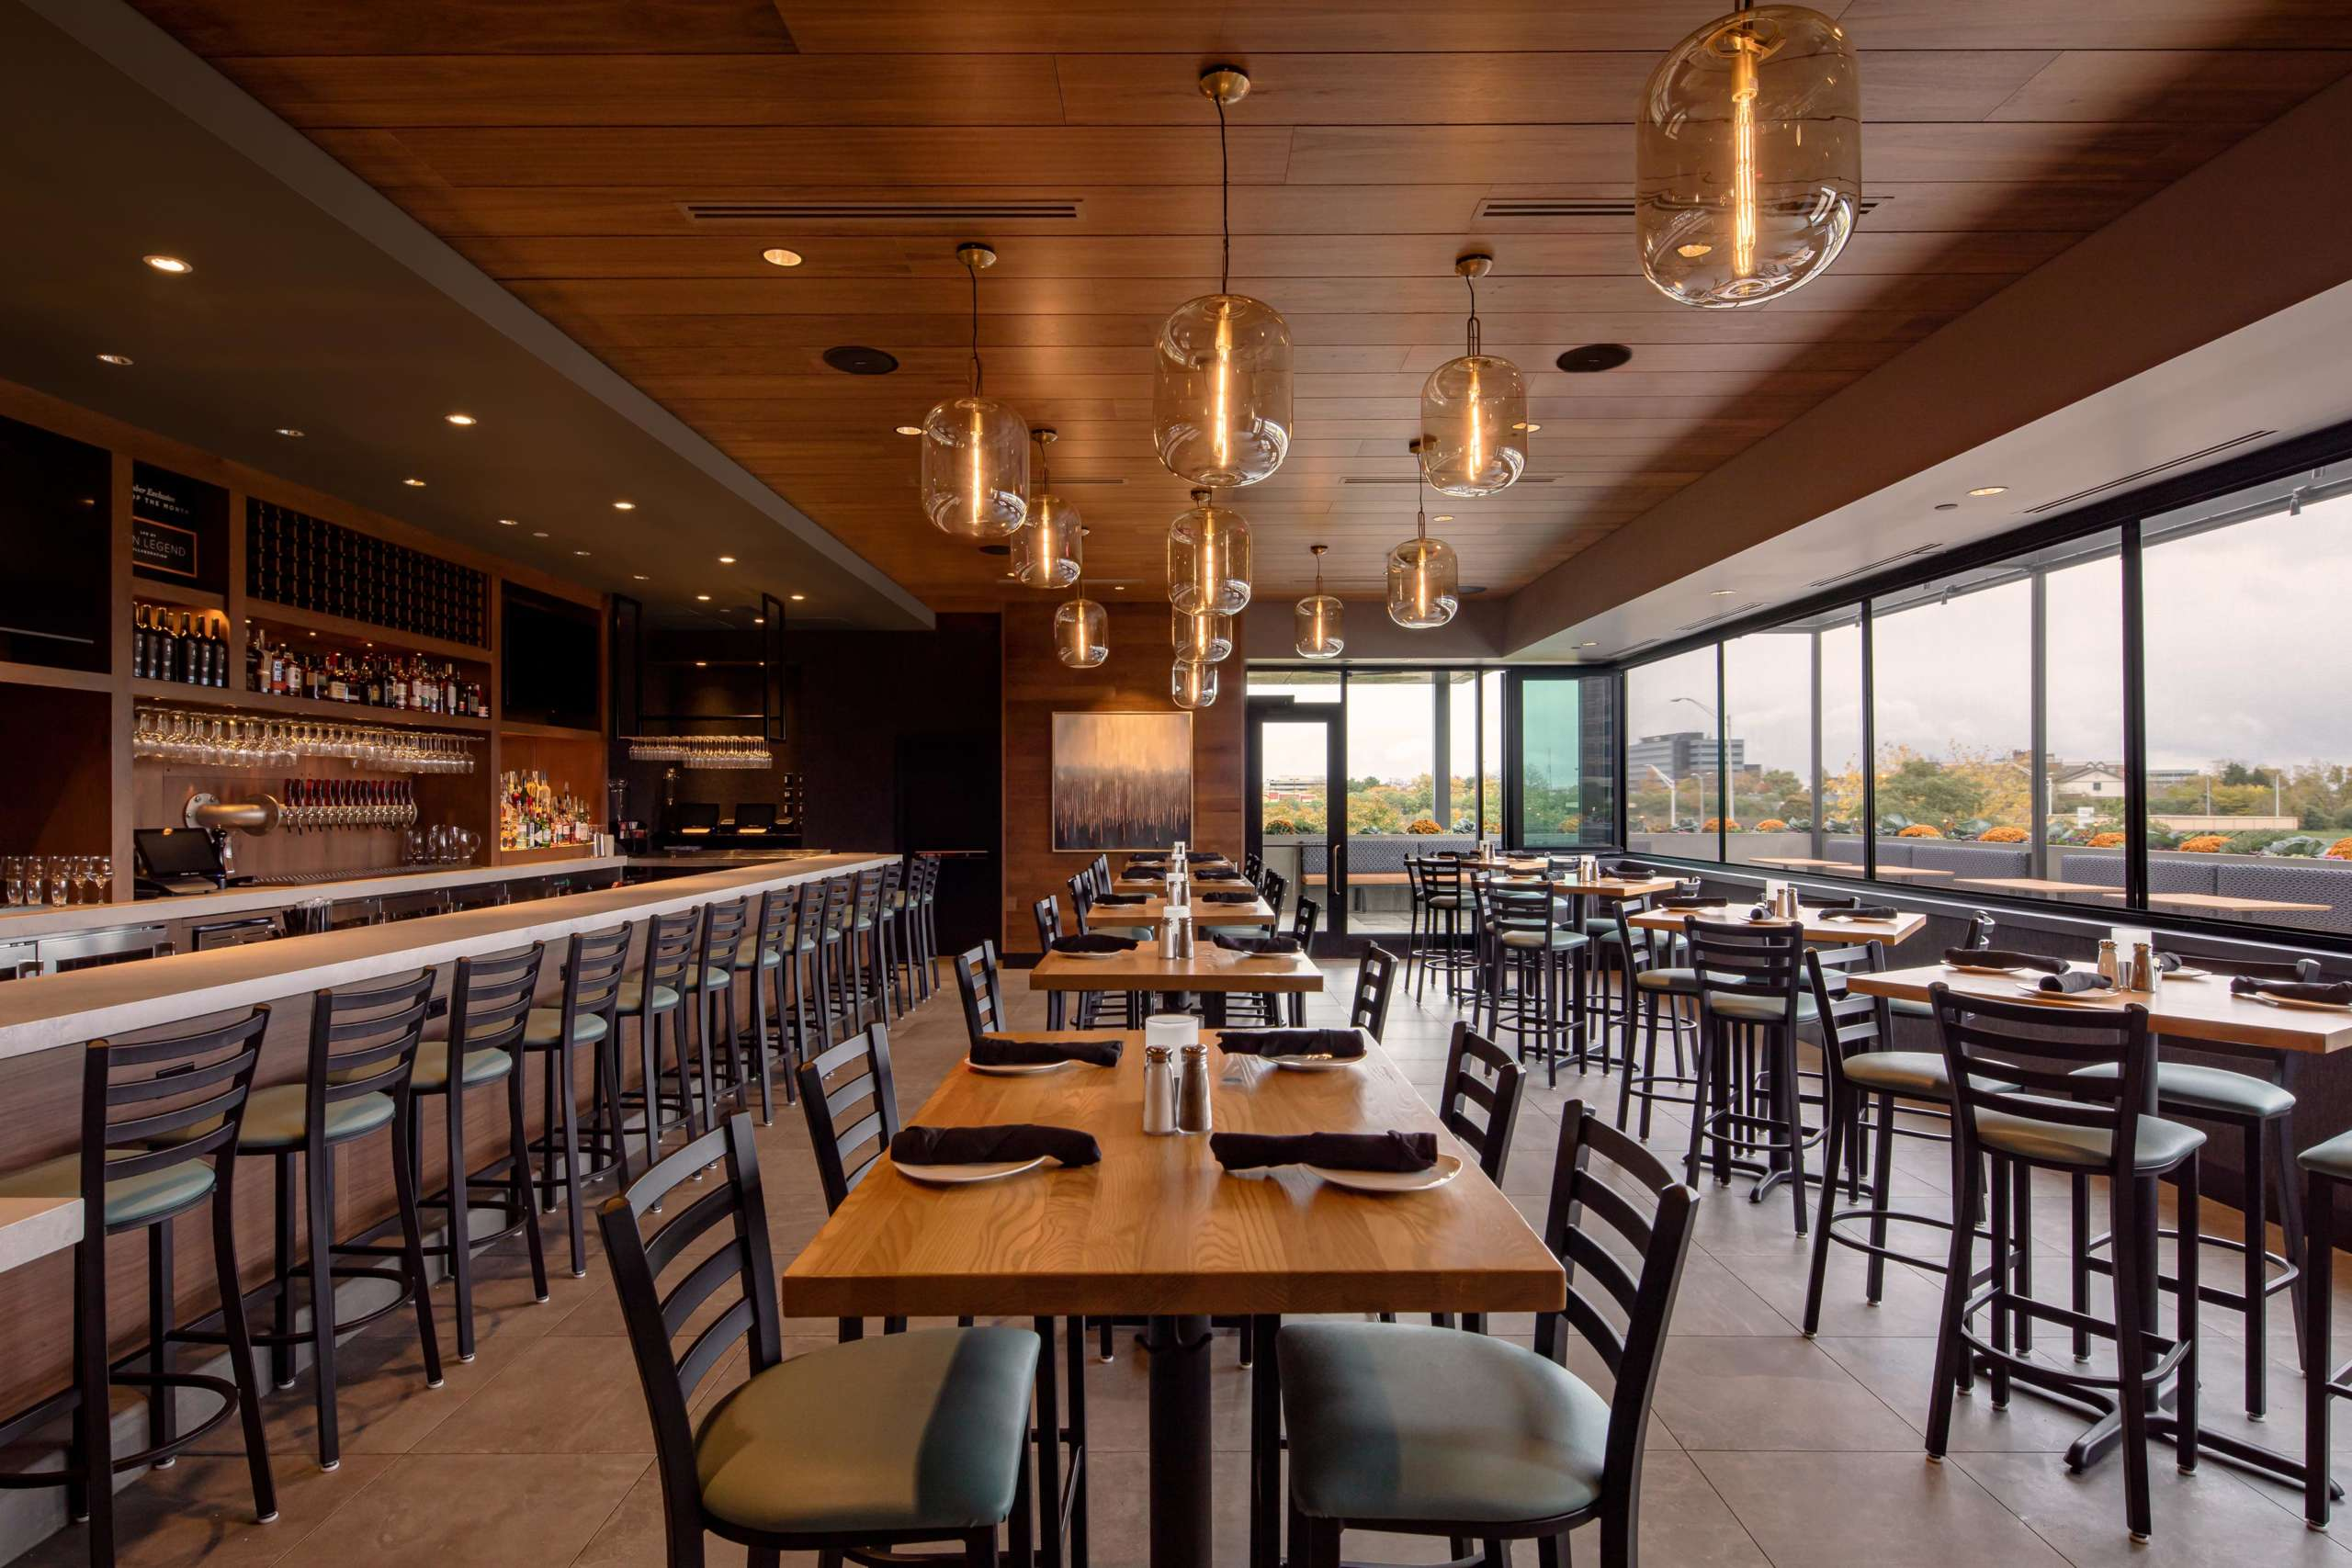 SoundPly Planks in dining area, Cooper's Hawk IL